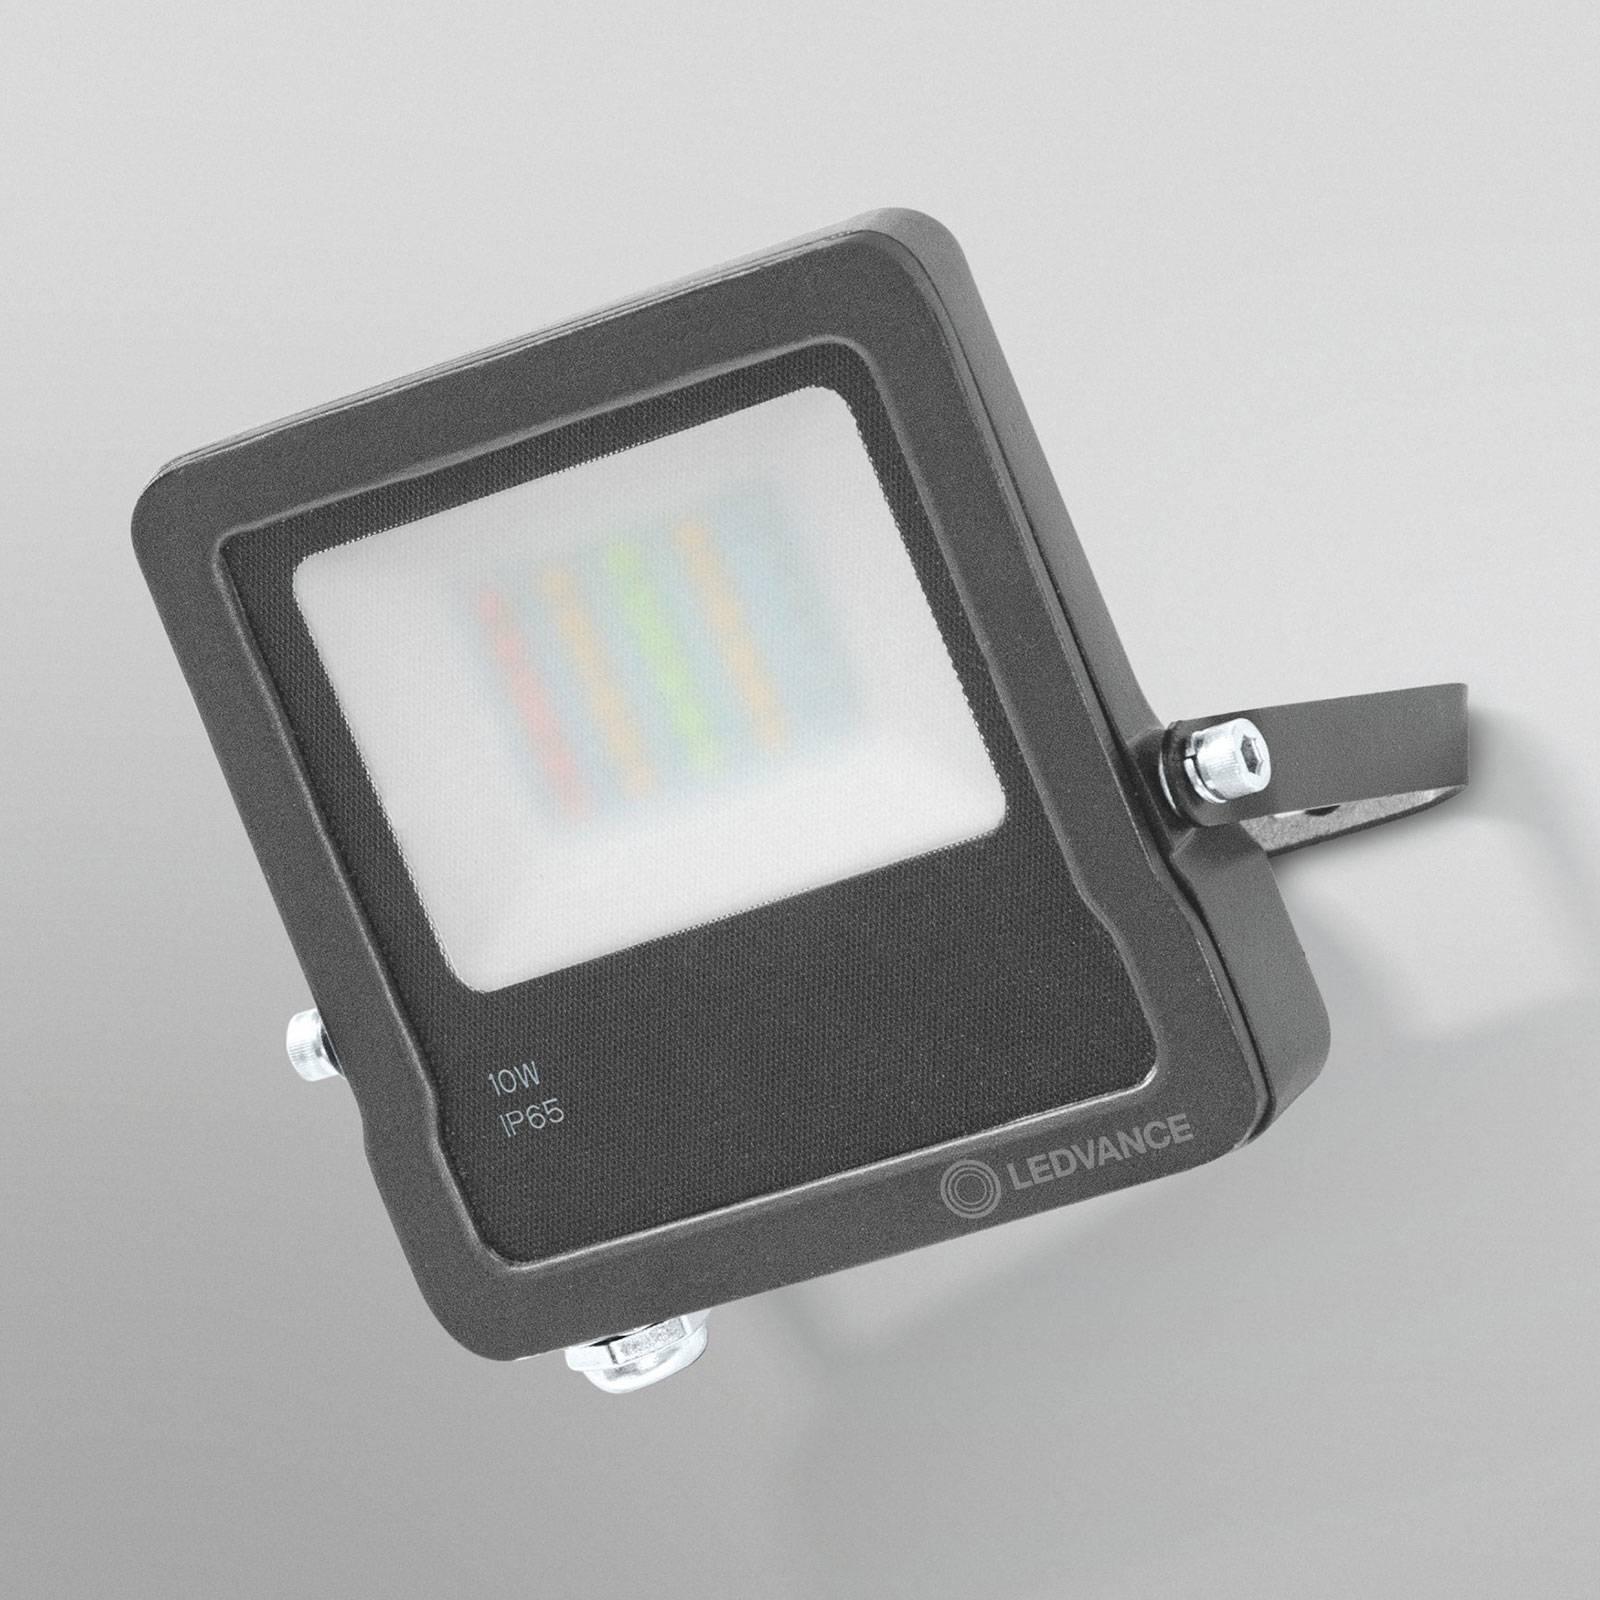 LEDVANCE SMART+ WiFi Flood-seinäkohdevalo RGBW 10W